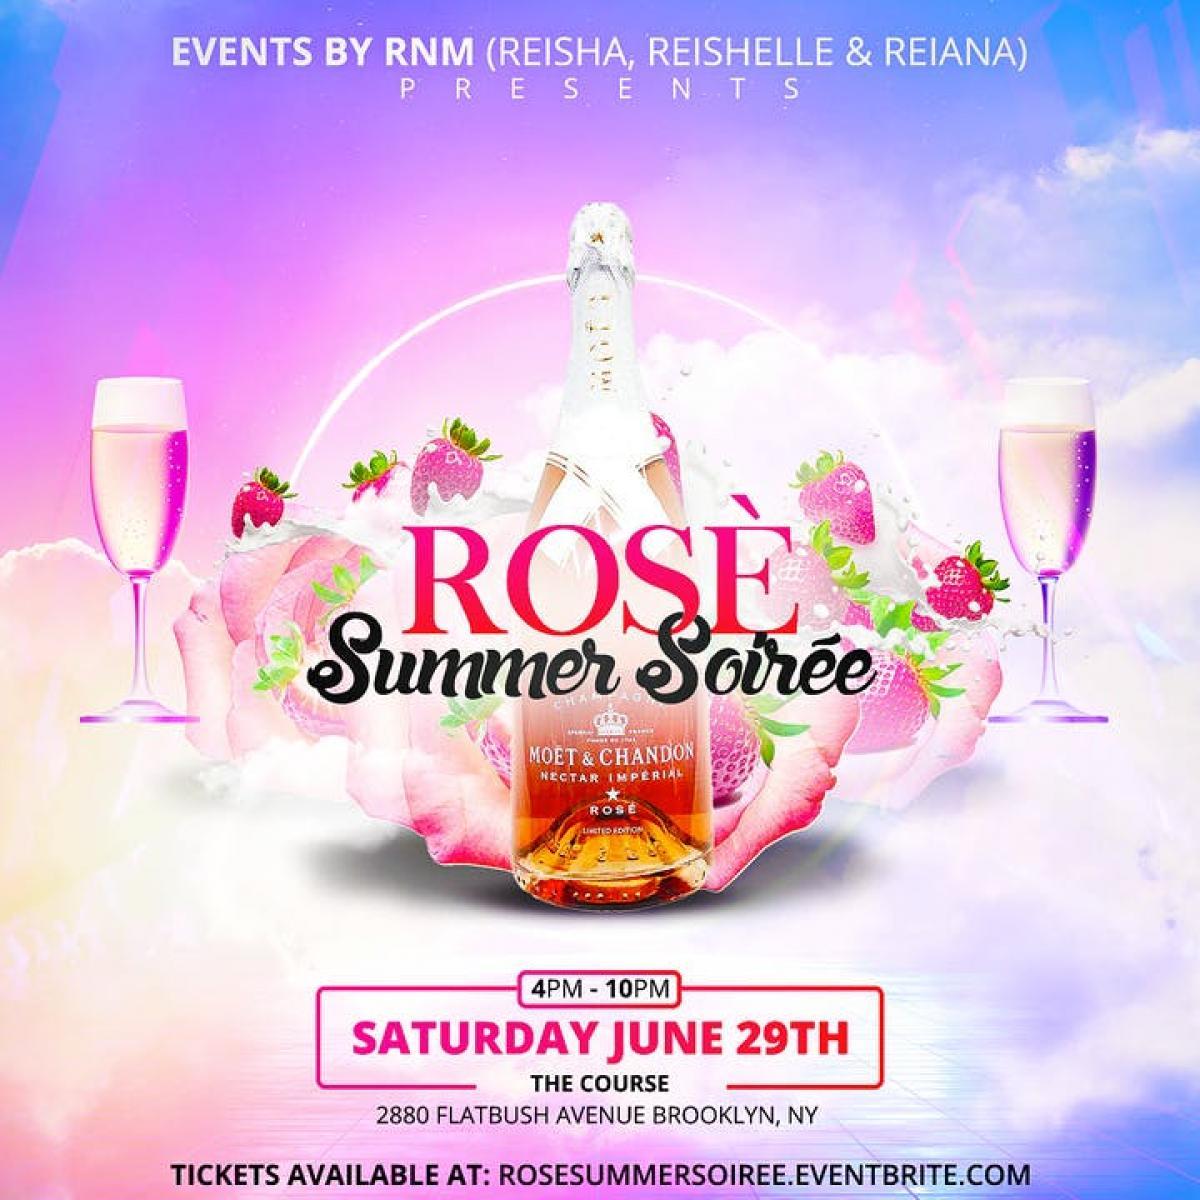 Rosè Summer Soirée flyer or graphic.